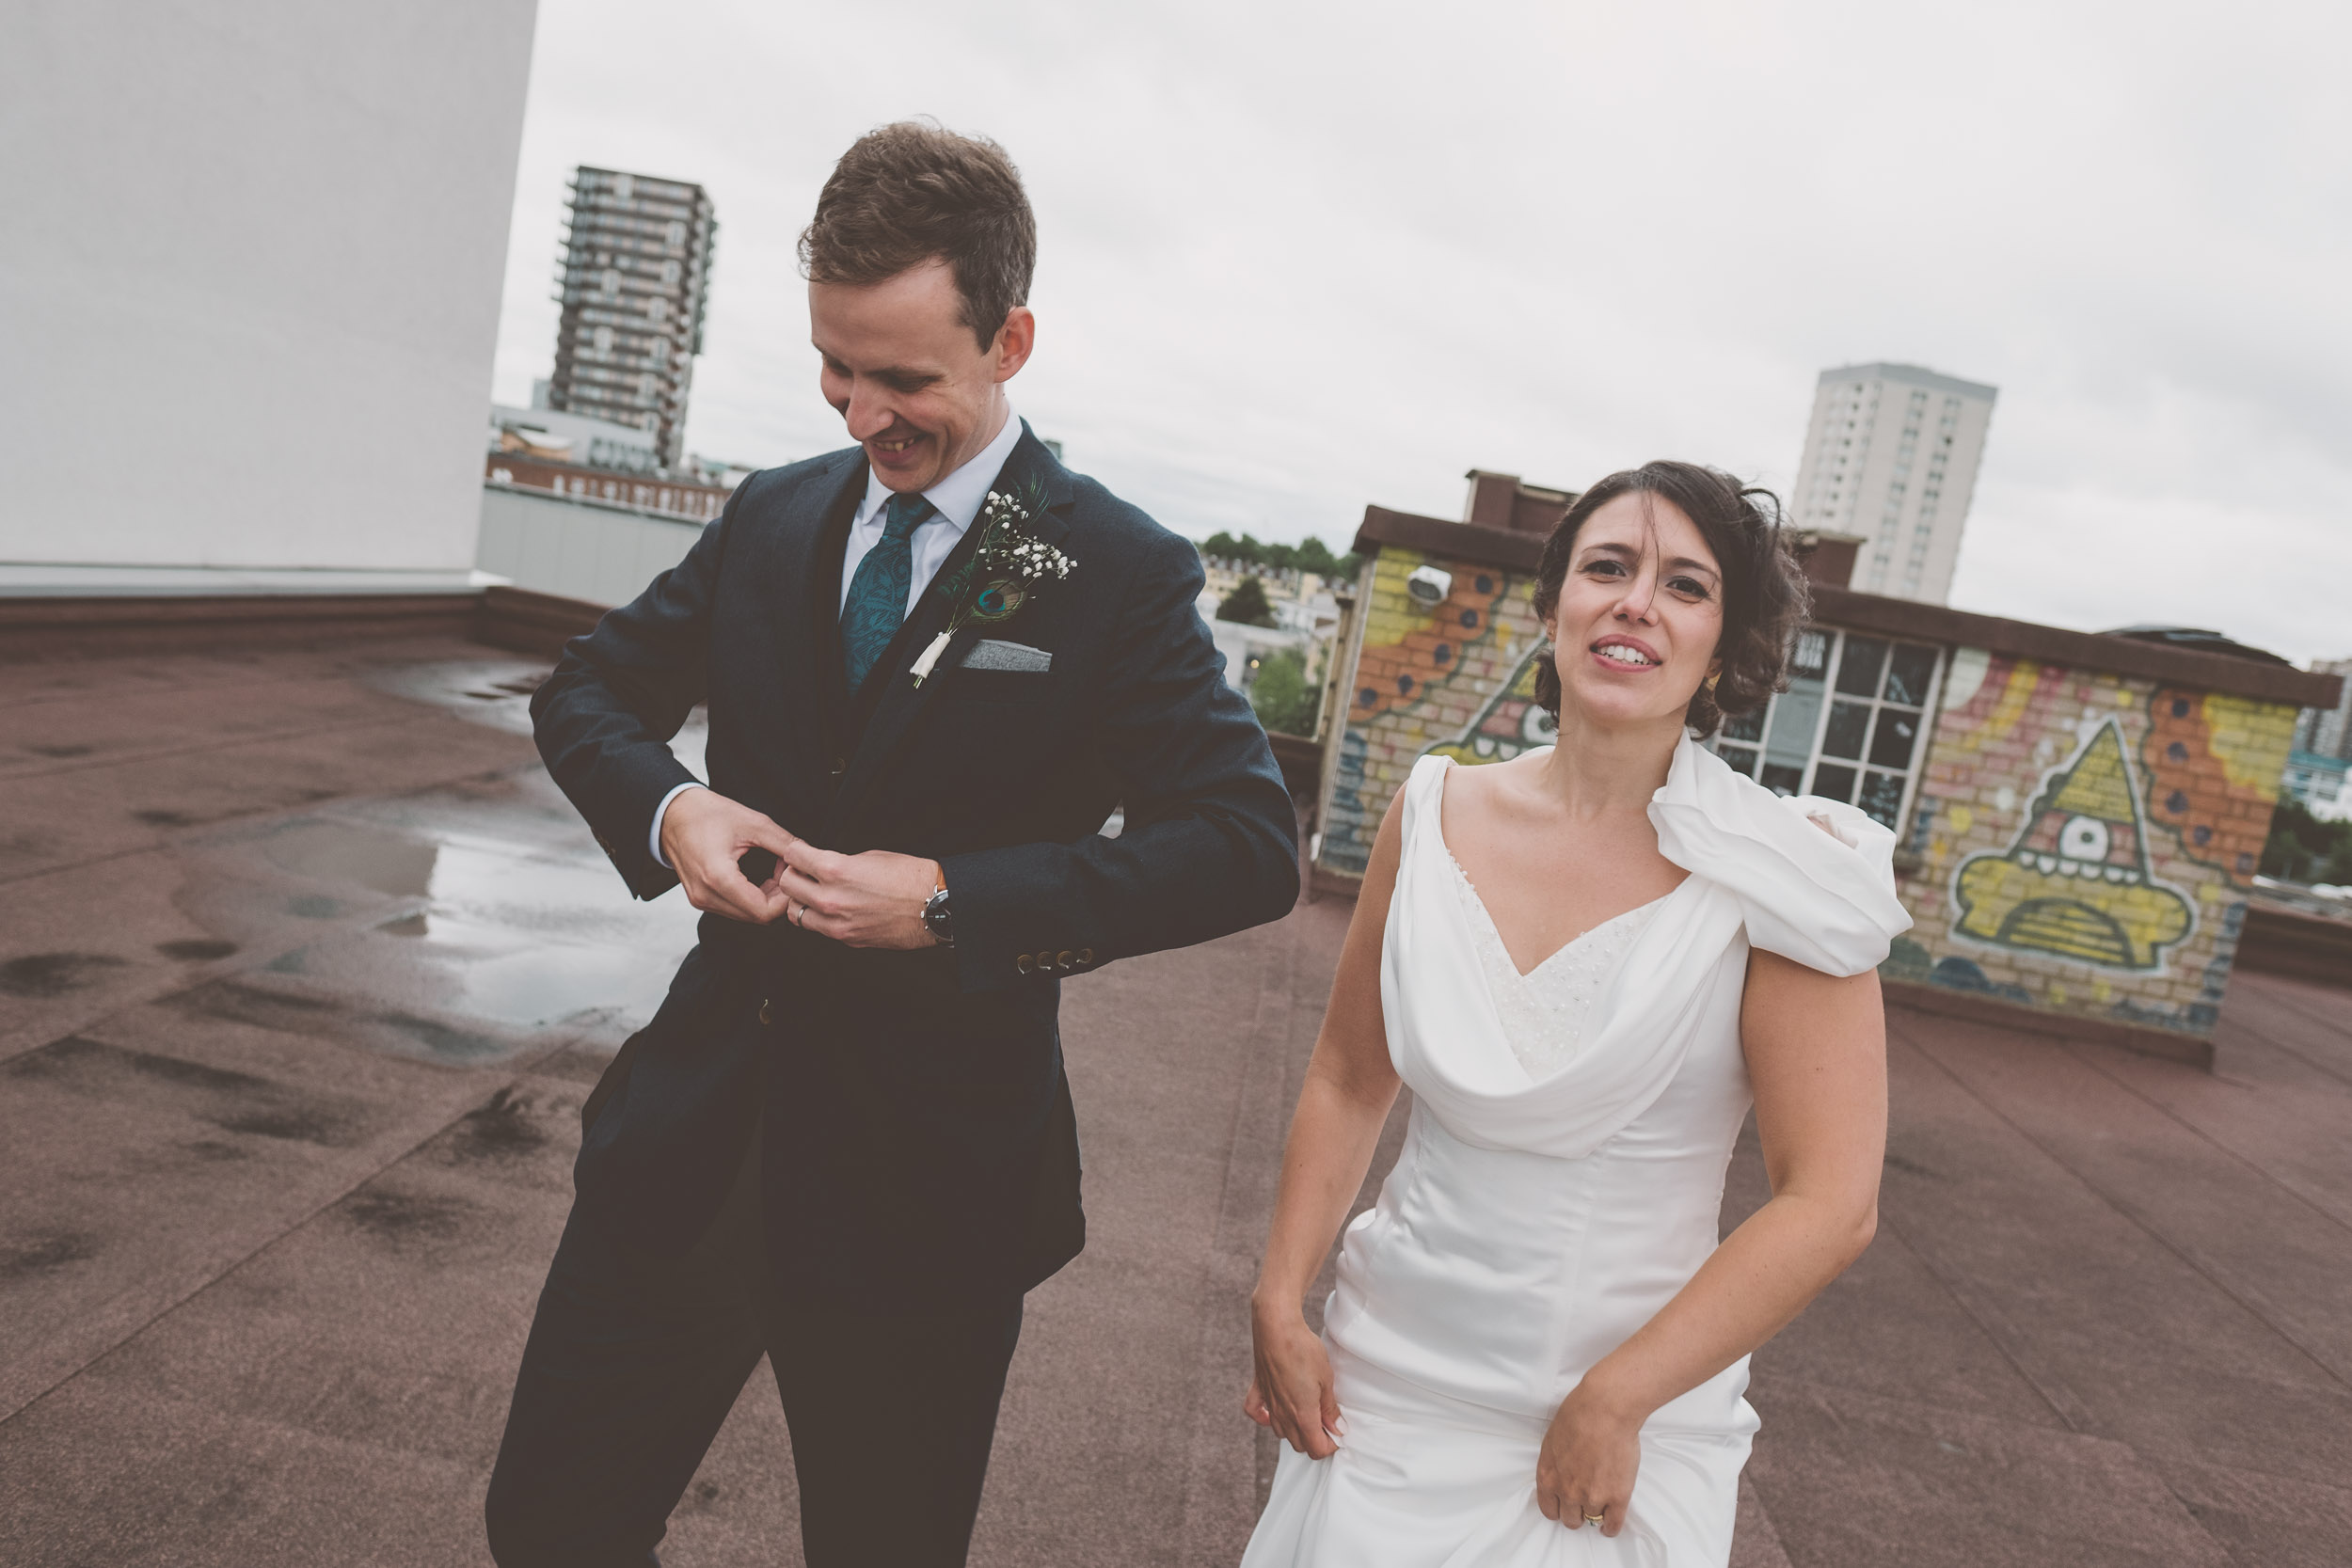 islington-town-hall-4th-floor-studios-wedding300.jpg